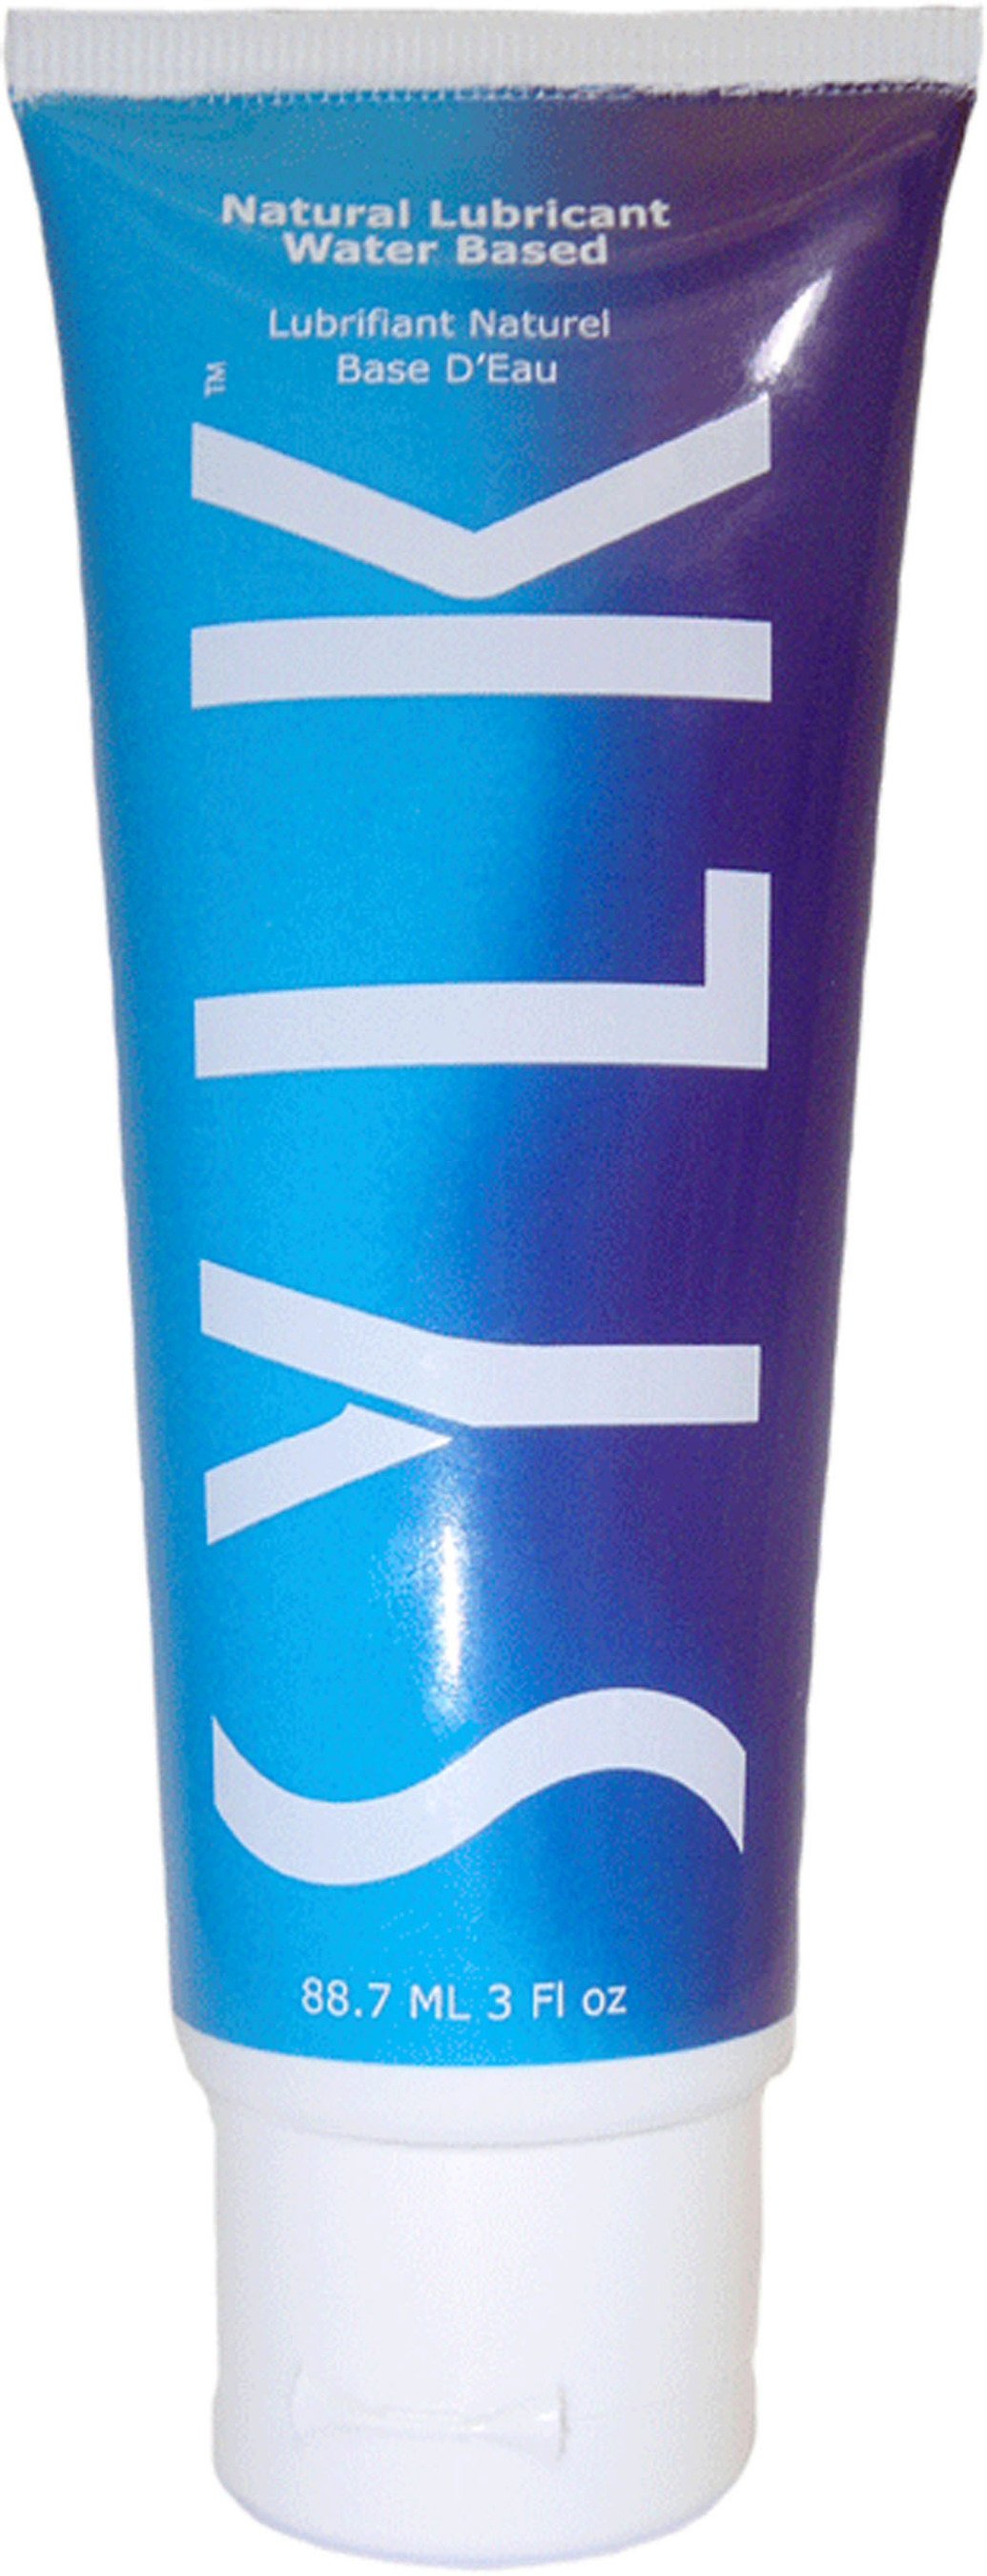 SYLK natural, water-based lubricant.  (PRNewsFoto/Smooth Oil LLC)